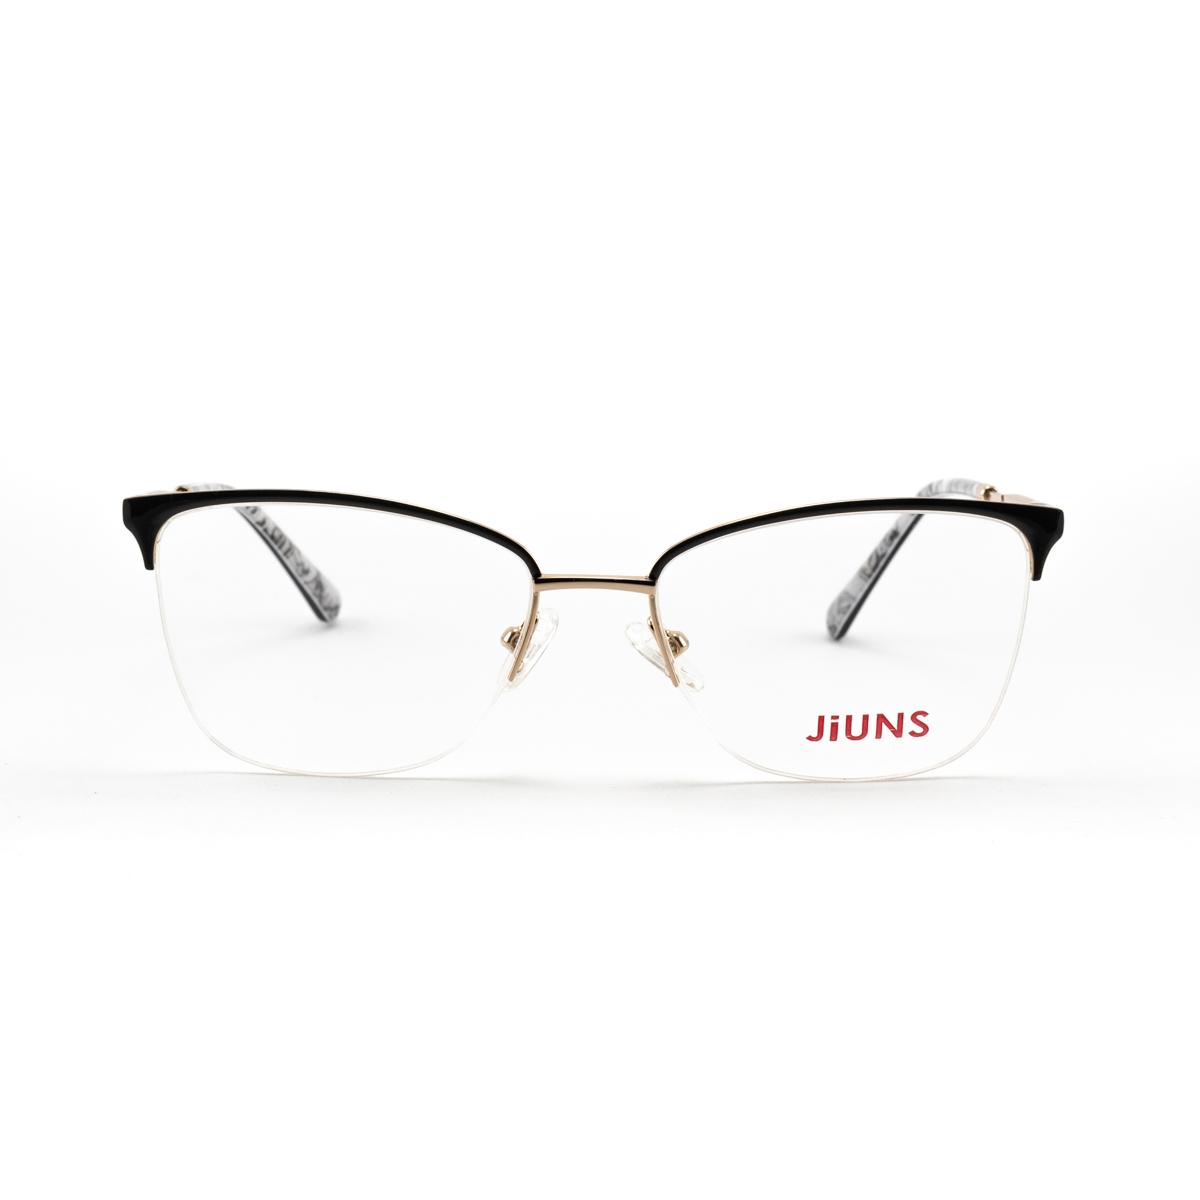 JiUNS MJ4345